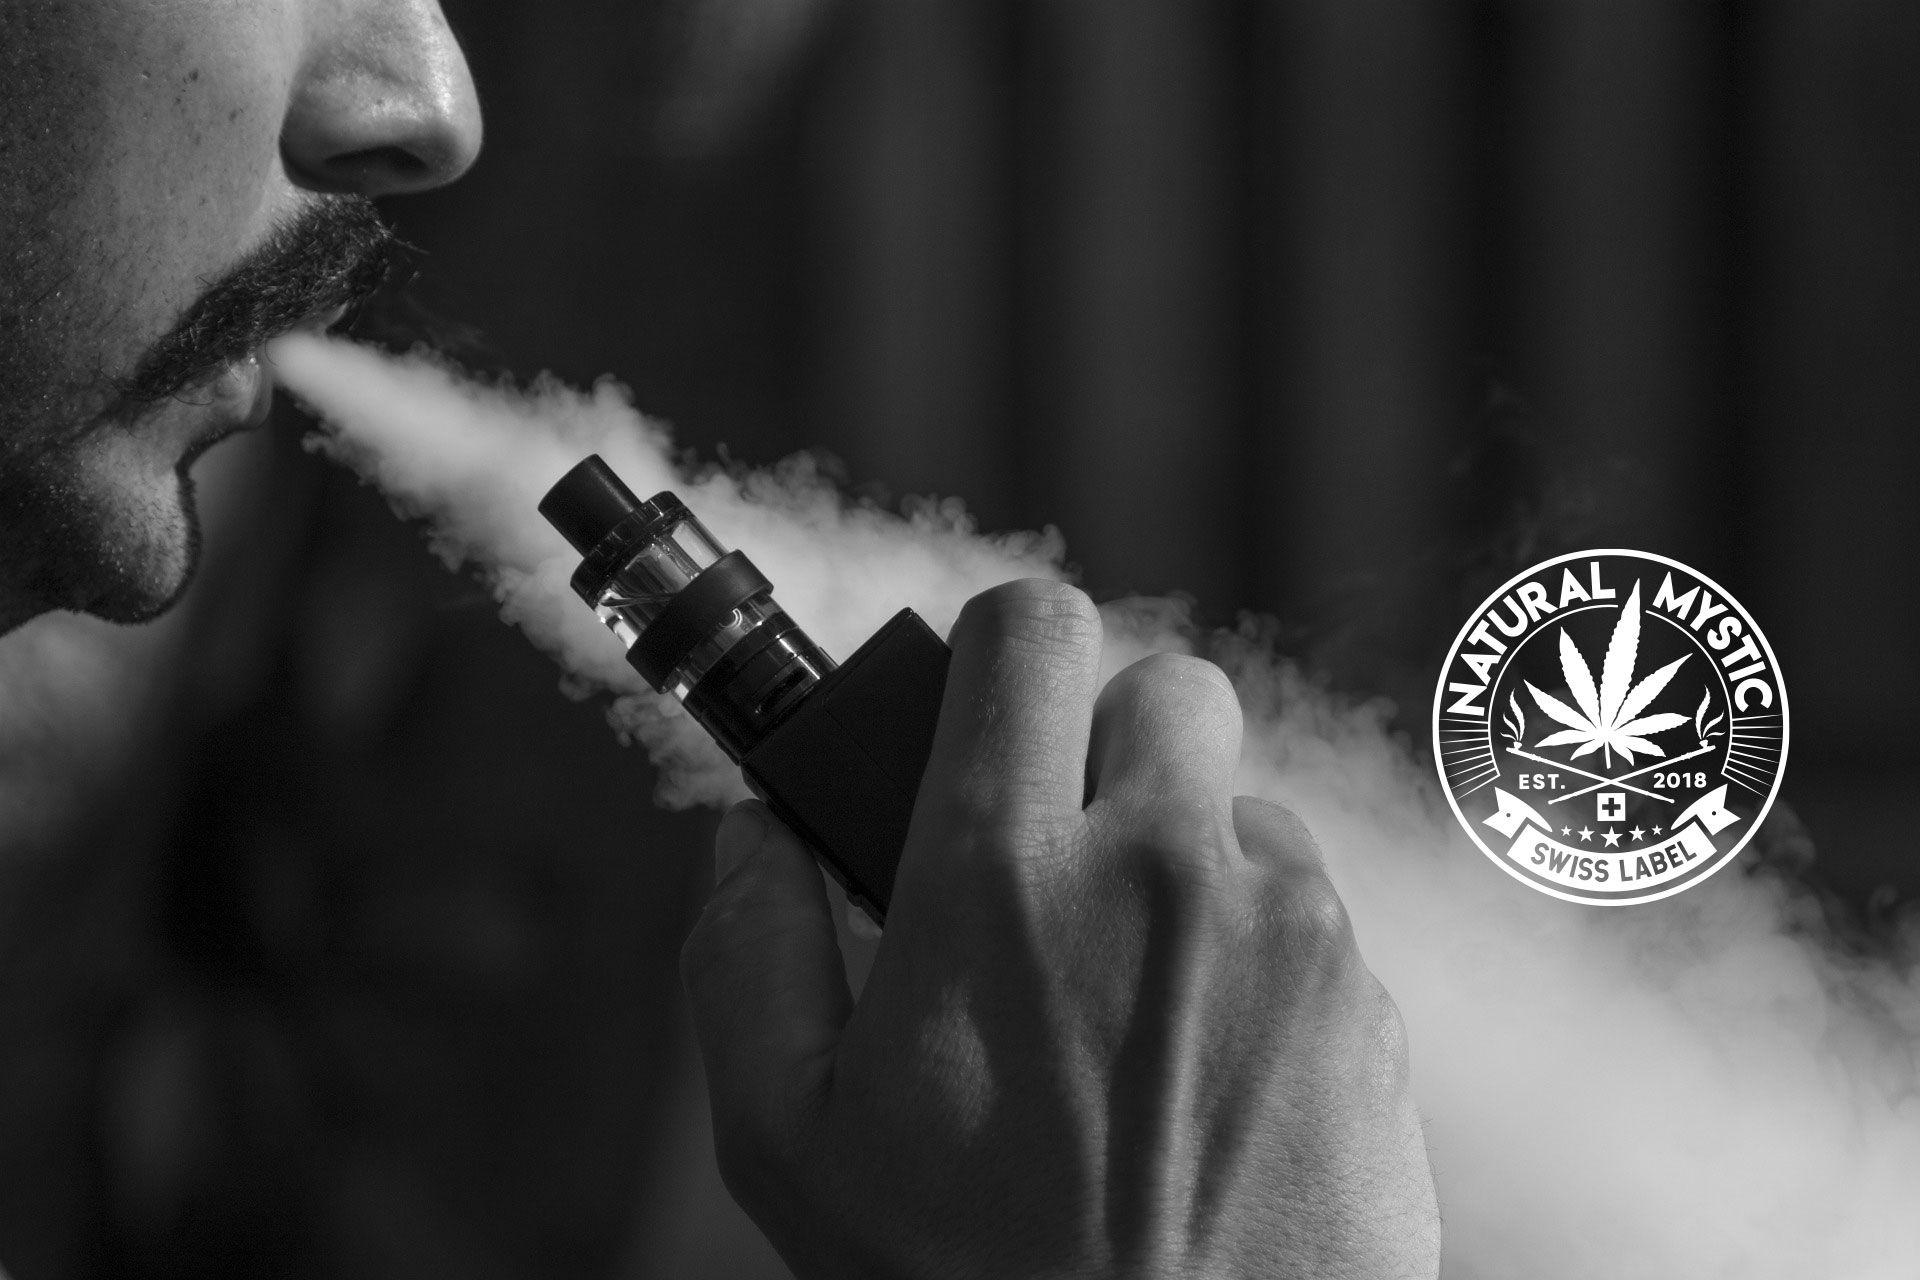 Vaporizers & E-cigarettes